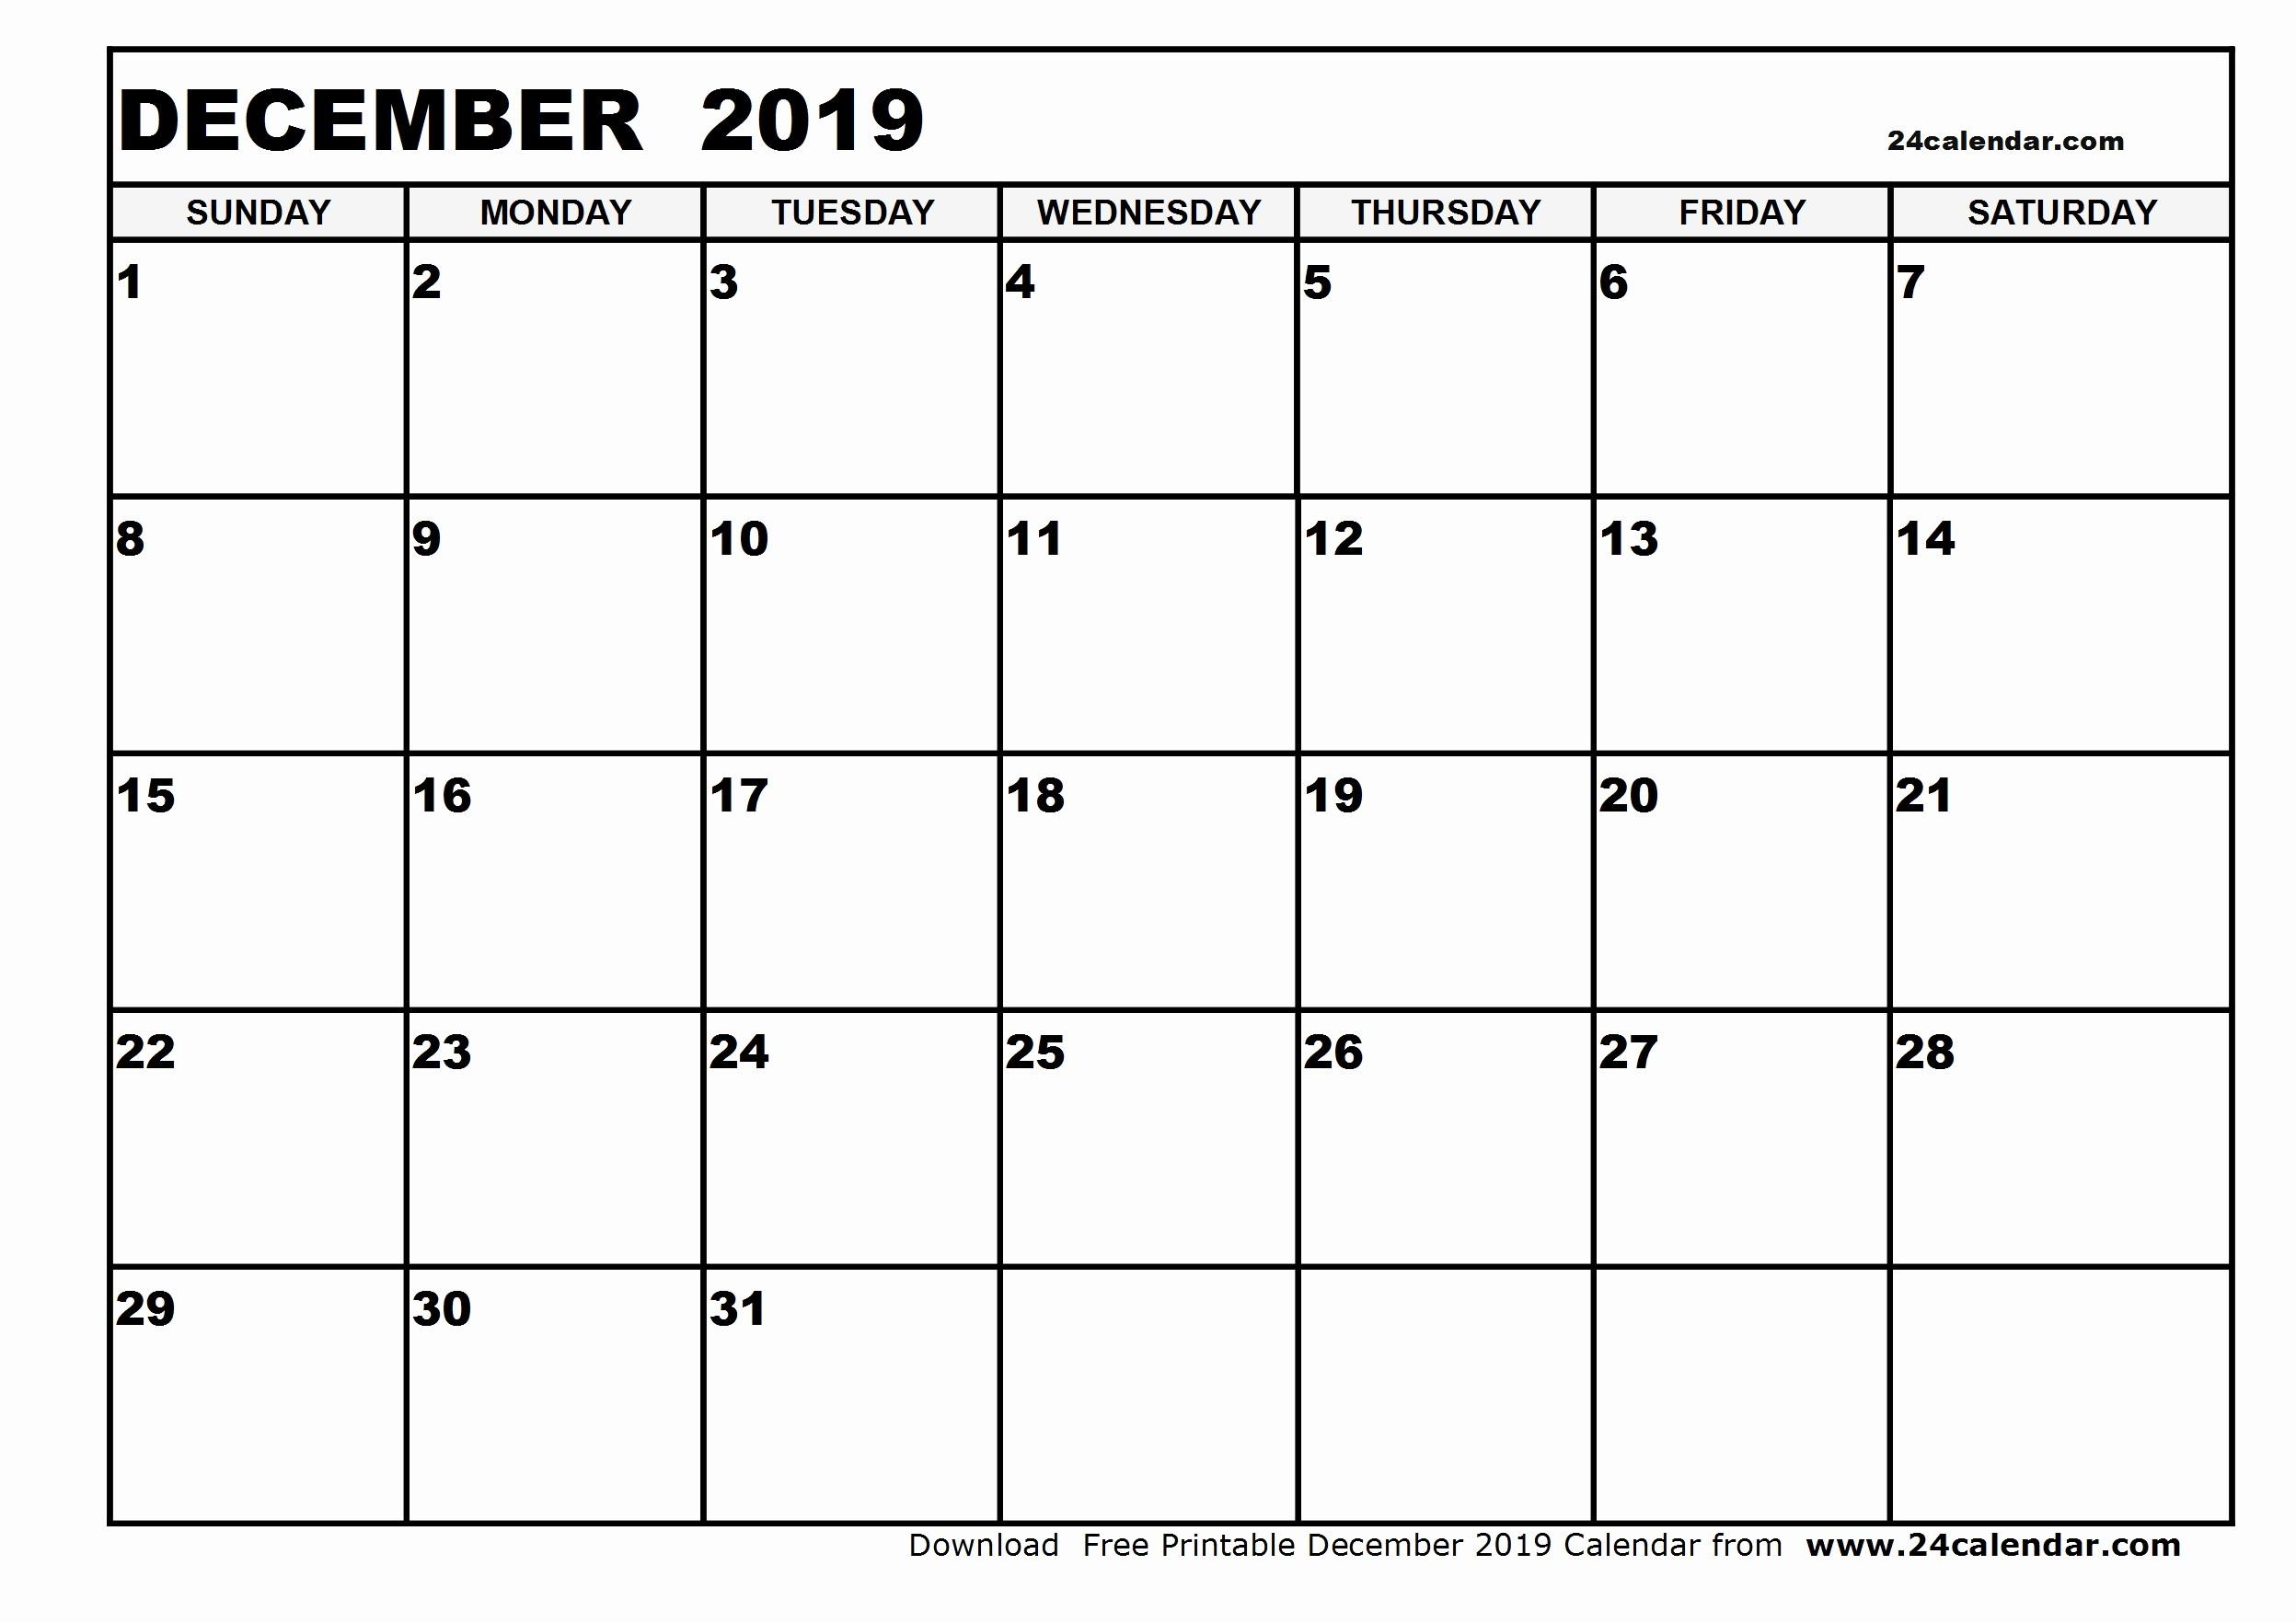 December 2019 Calendar Wincalendar | Calendar Template